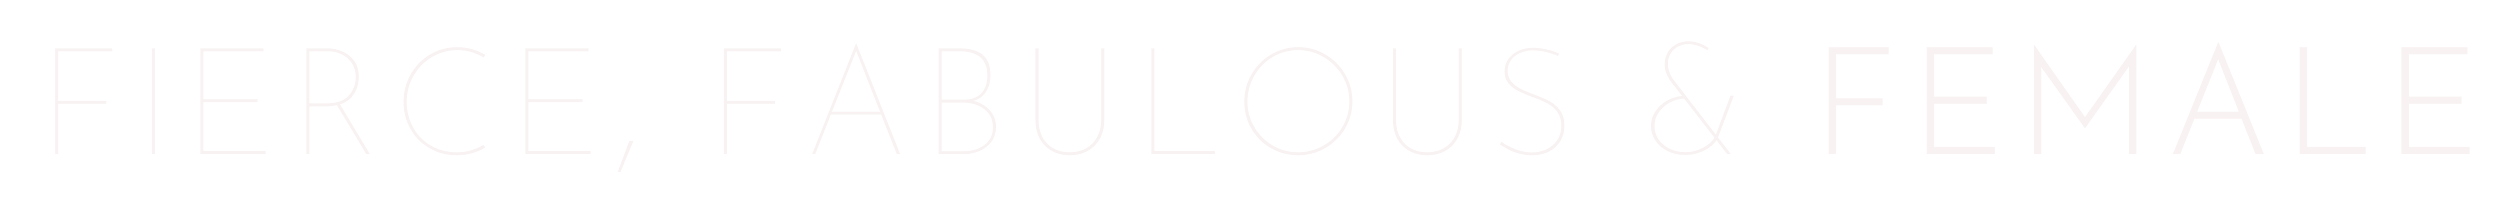 Fierce, fabulous and female logo